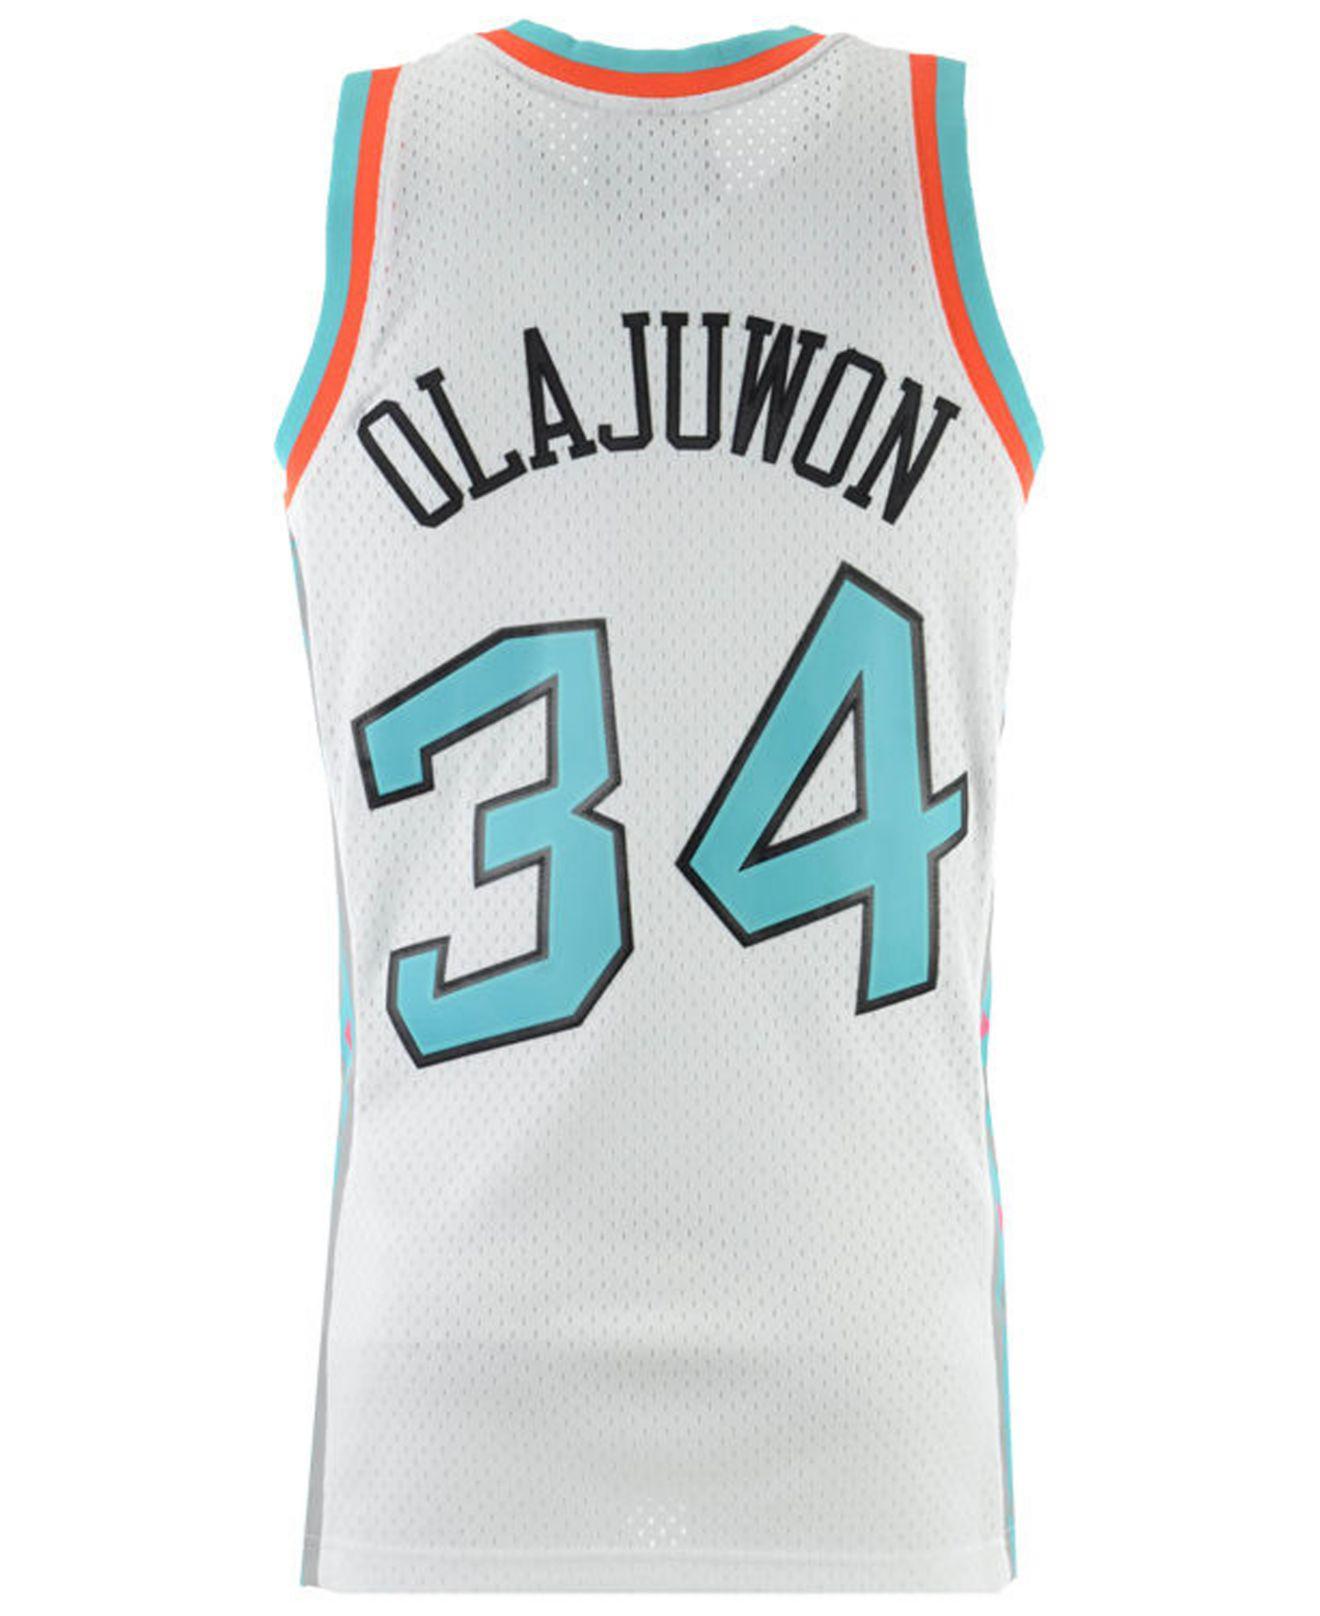 best sneakers c4d88 6cc99 Men's Blue Hakeem Olajuwon Nba All Star 1996 Swingman Jersey